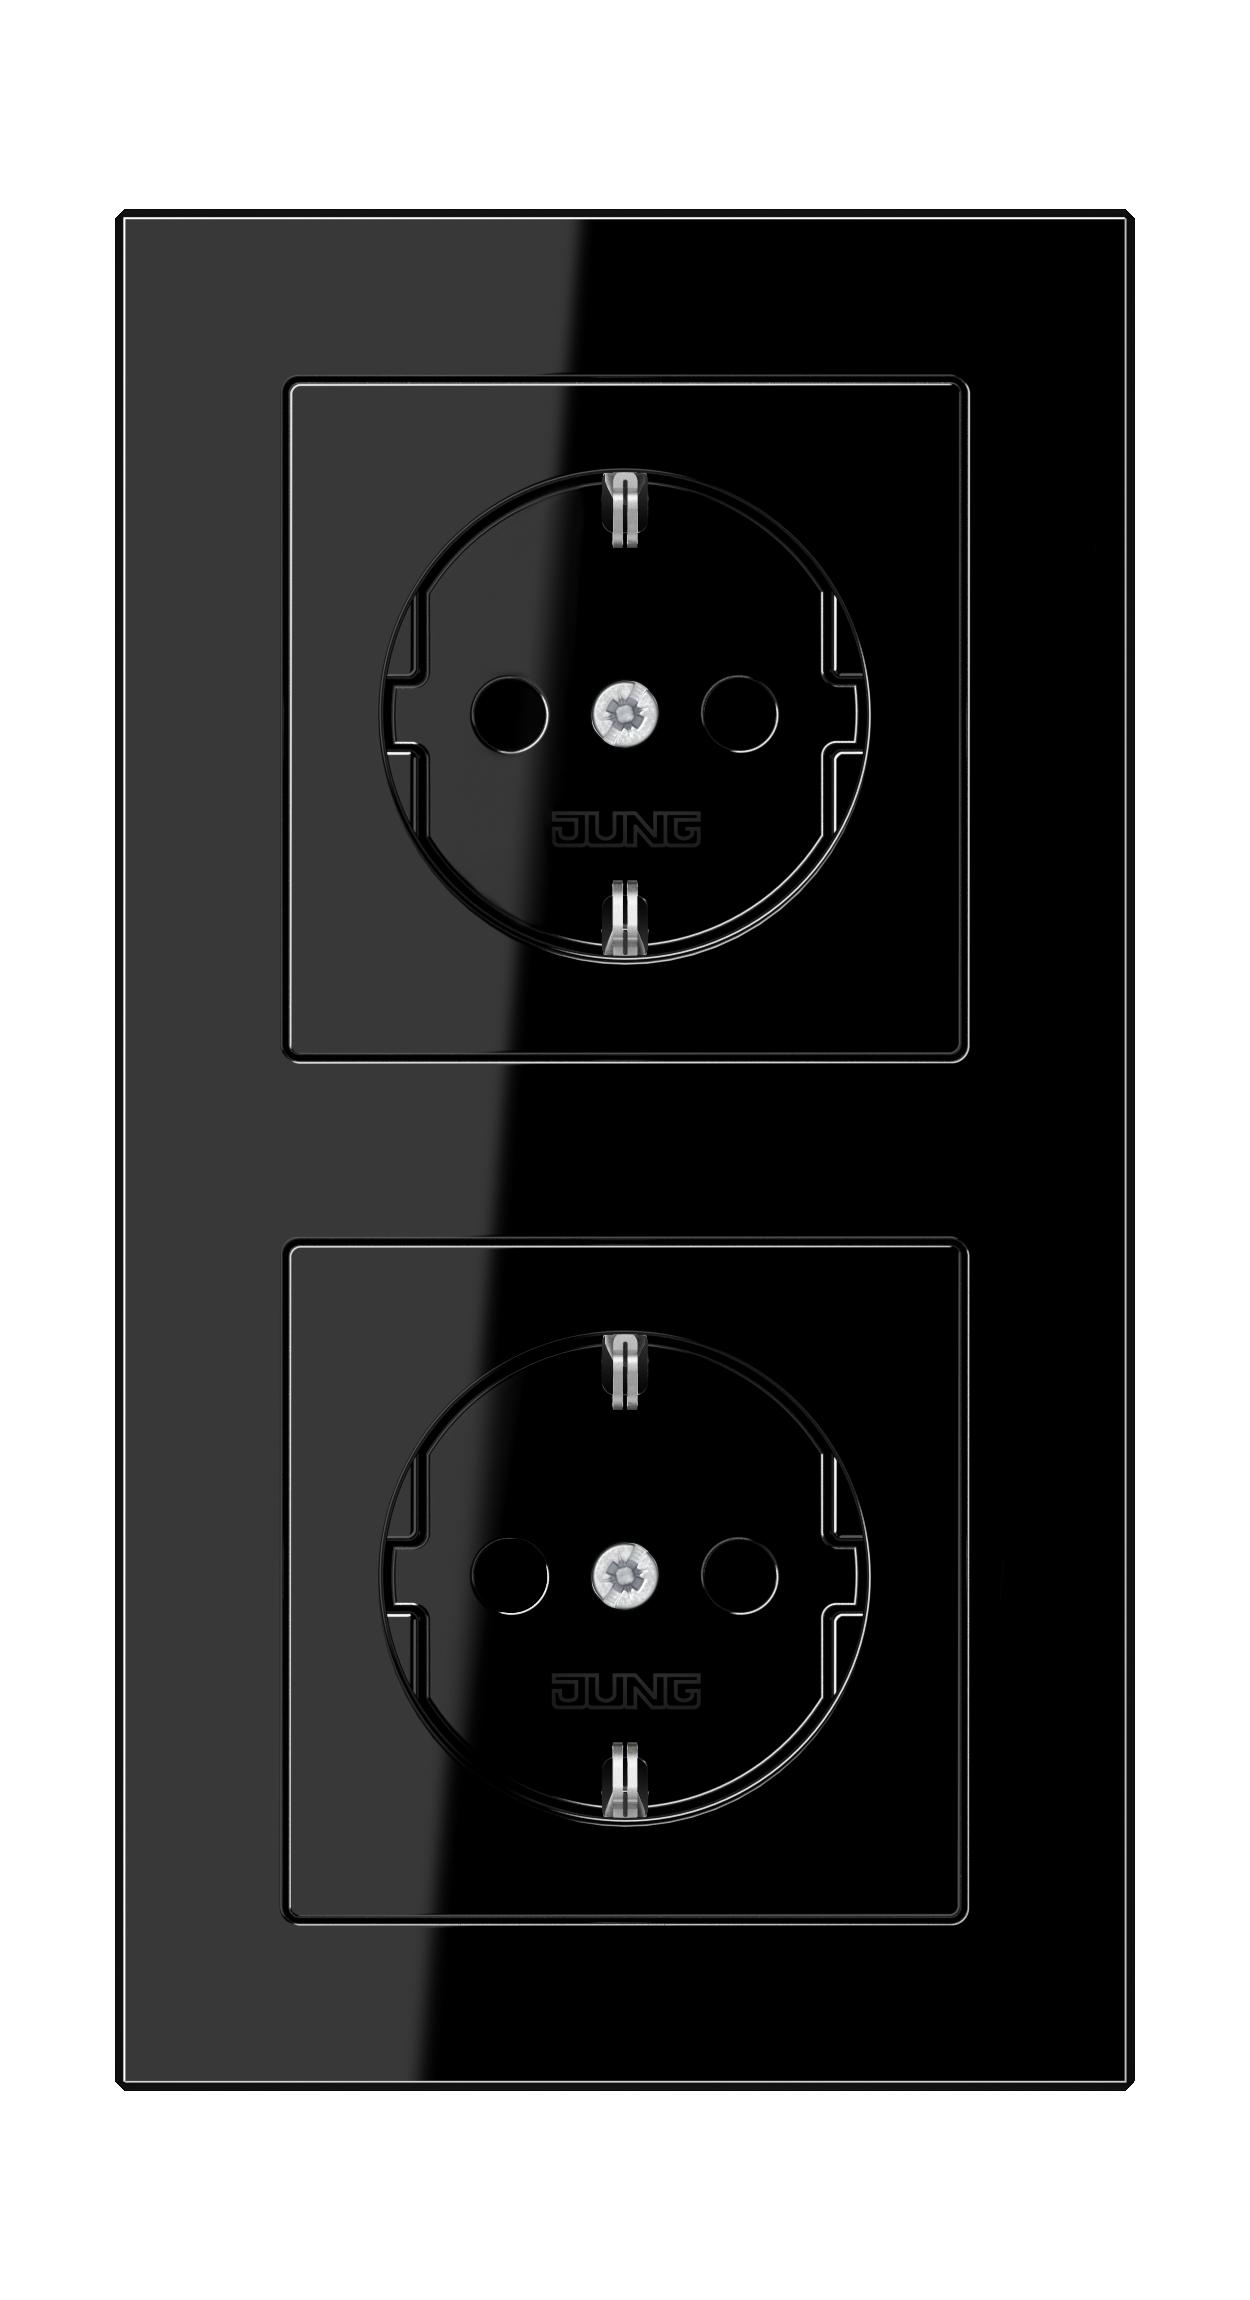 JUNG_AC_black_socket-socket